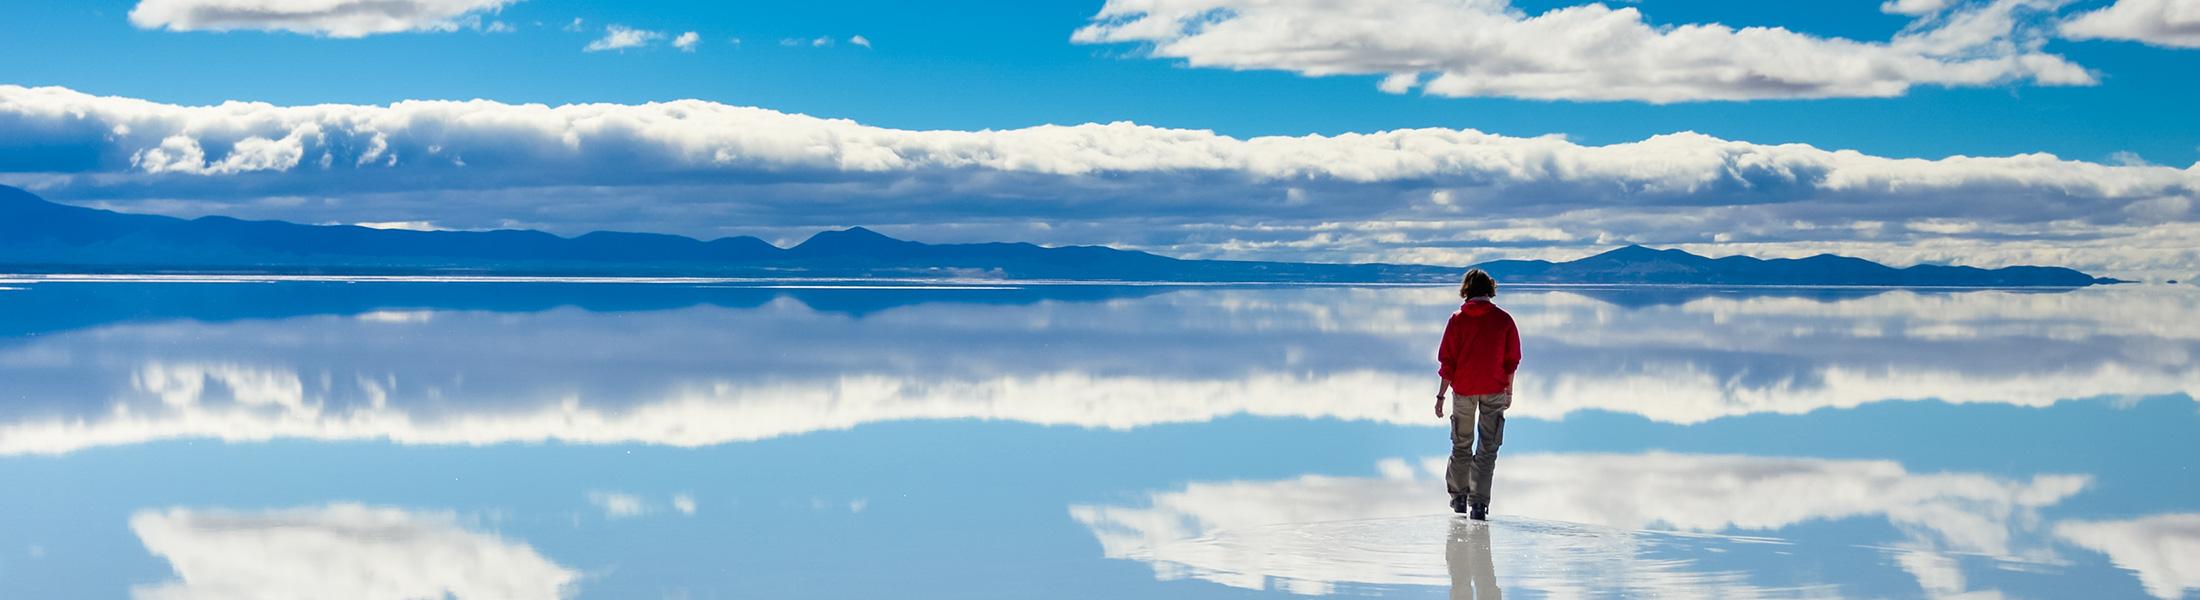 Woman on Salar de Uyuni Salt Flats Bolivia